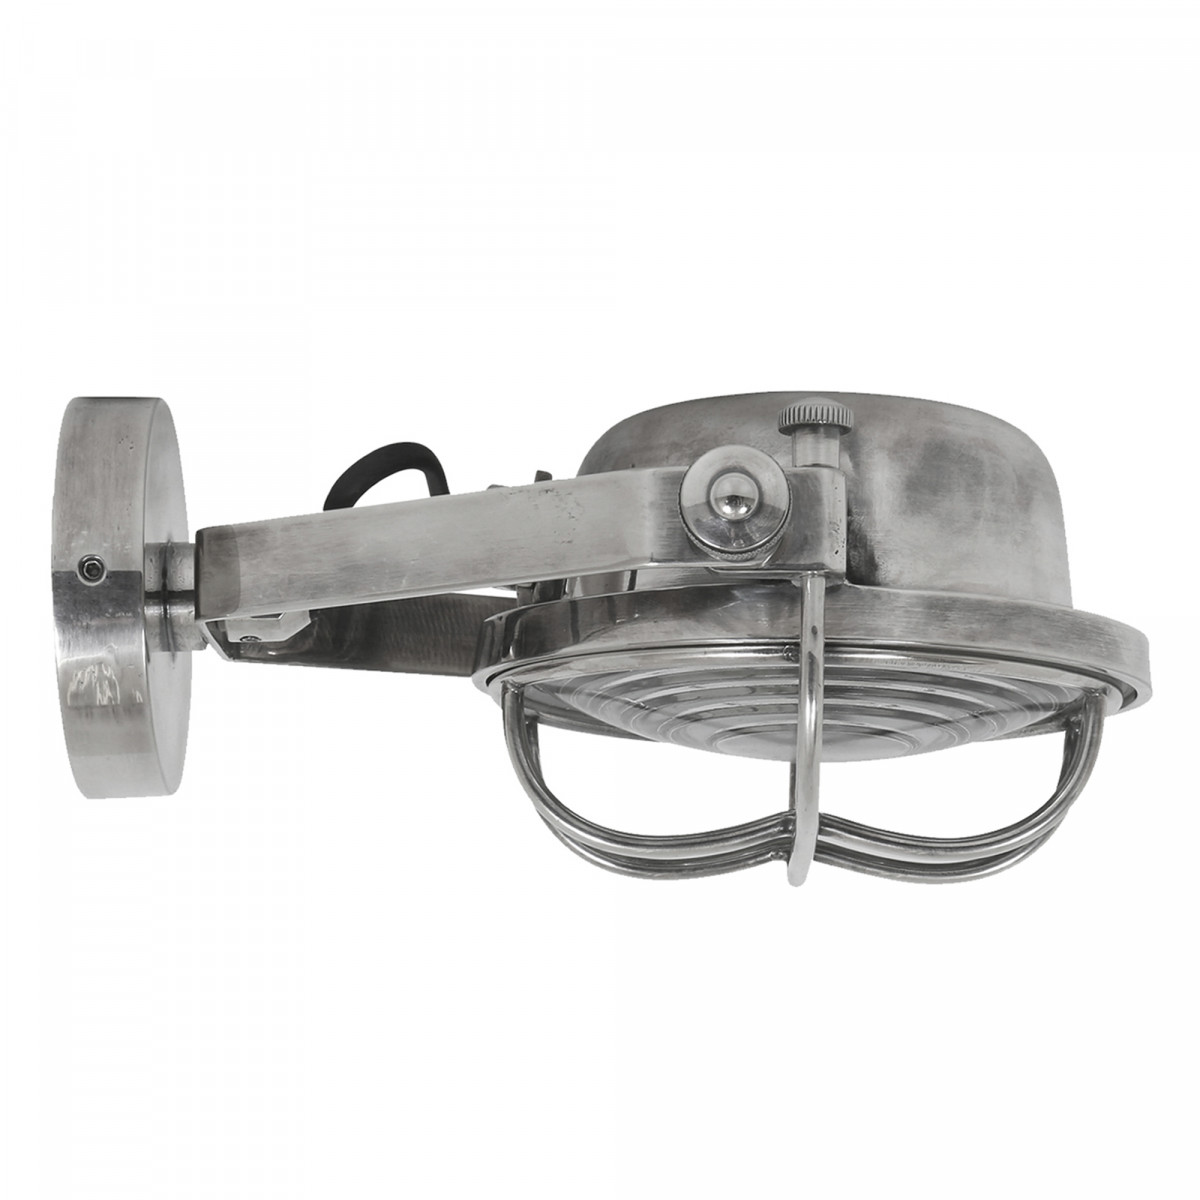 Retro Deckenstrahler Bixby Silber im Industrial Stil